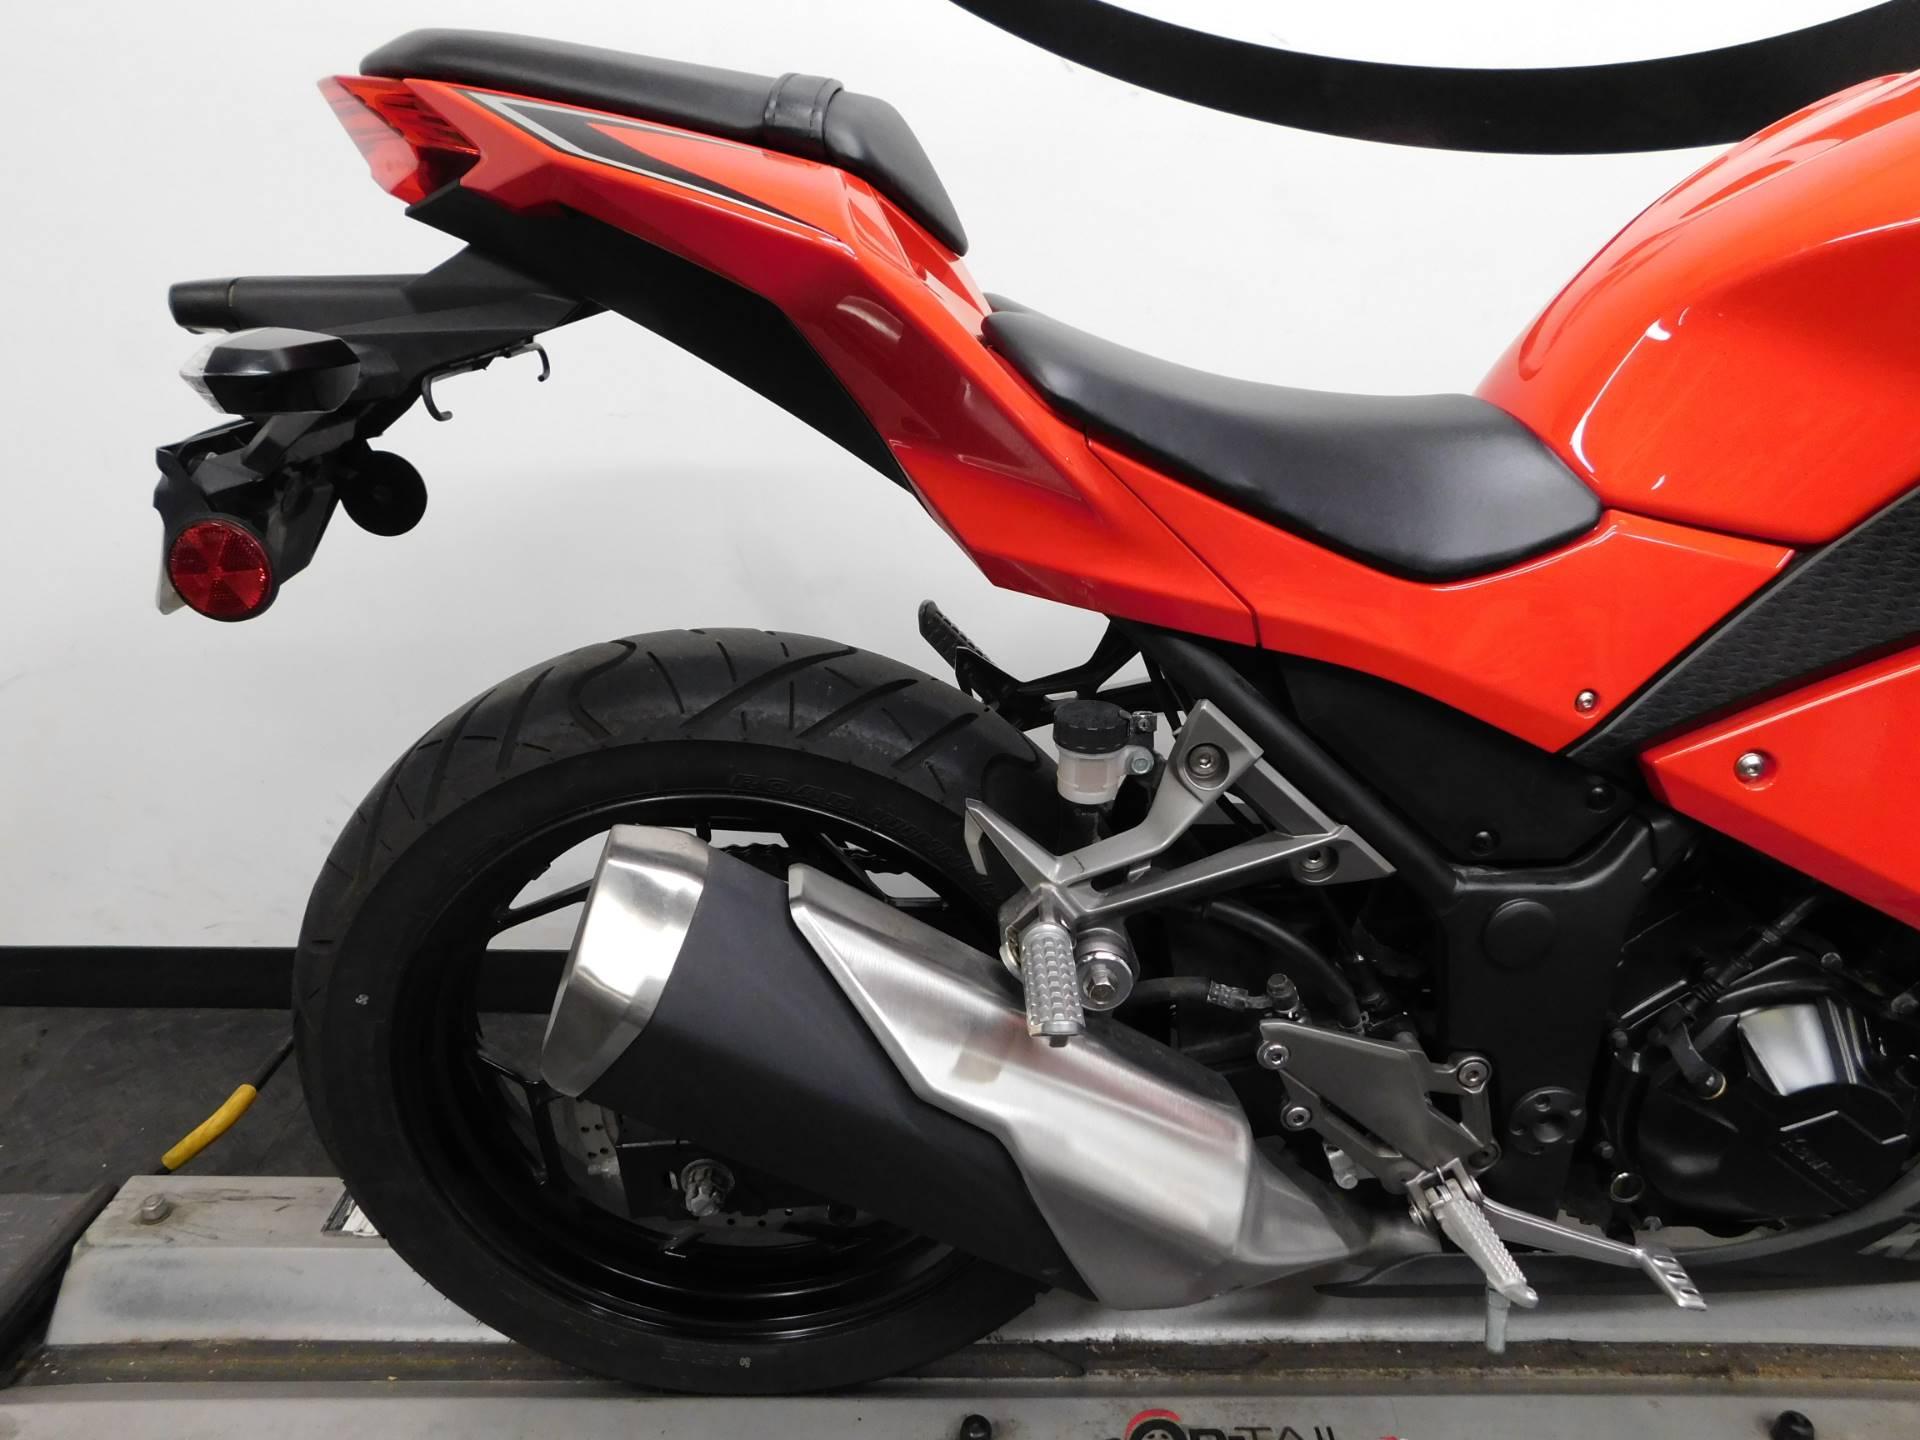 Used 2016 Kawasaki Ninja 300 Motorcycles In Eden Prairie Mn Stock Fuel Filter Minnesota